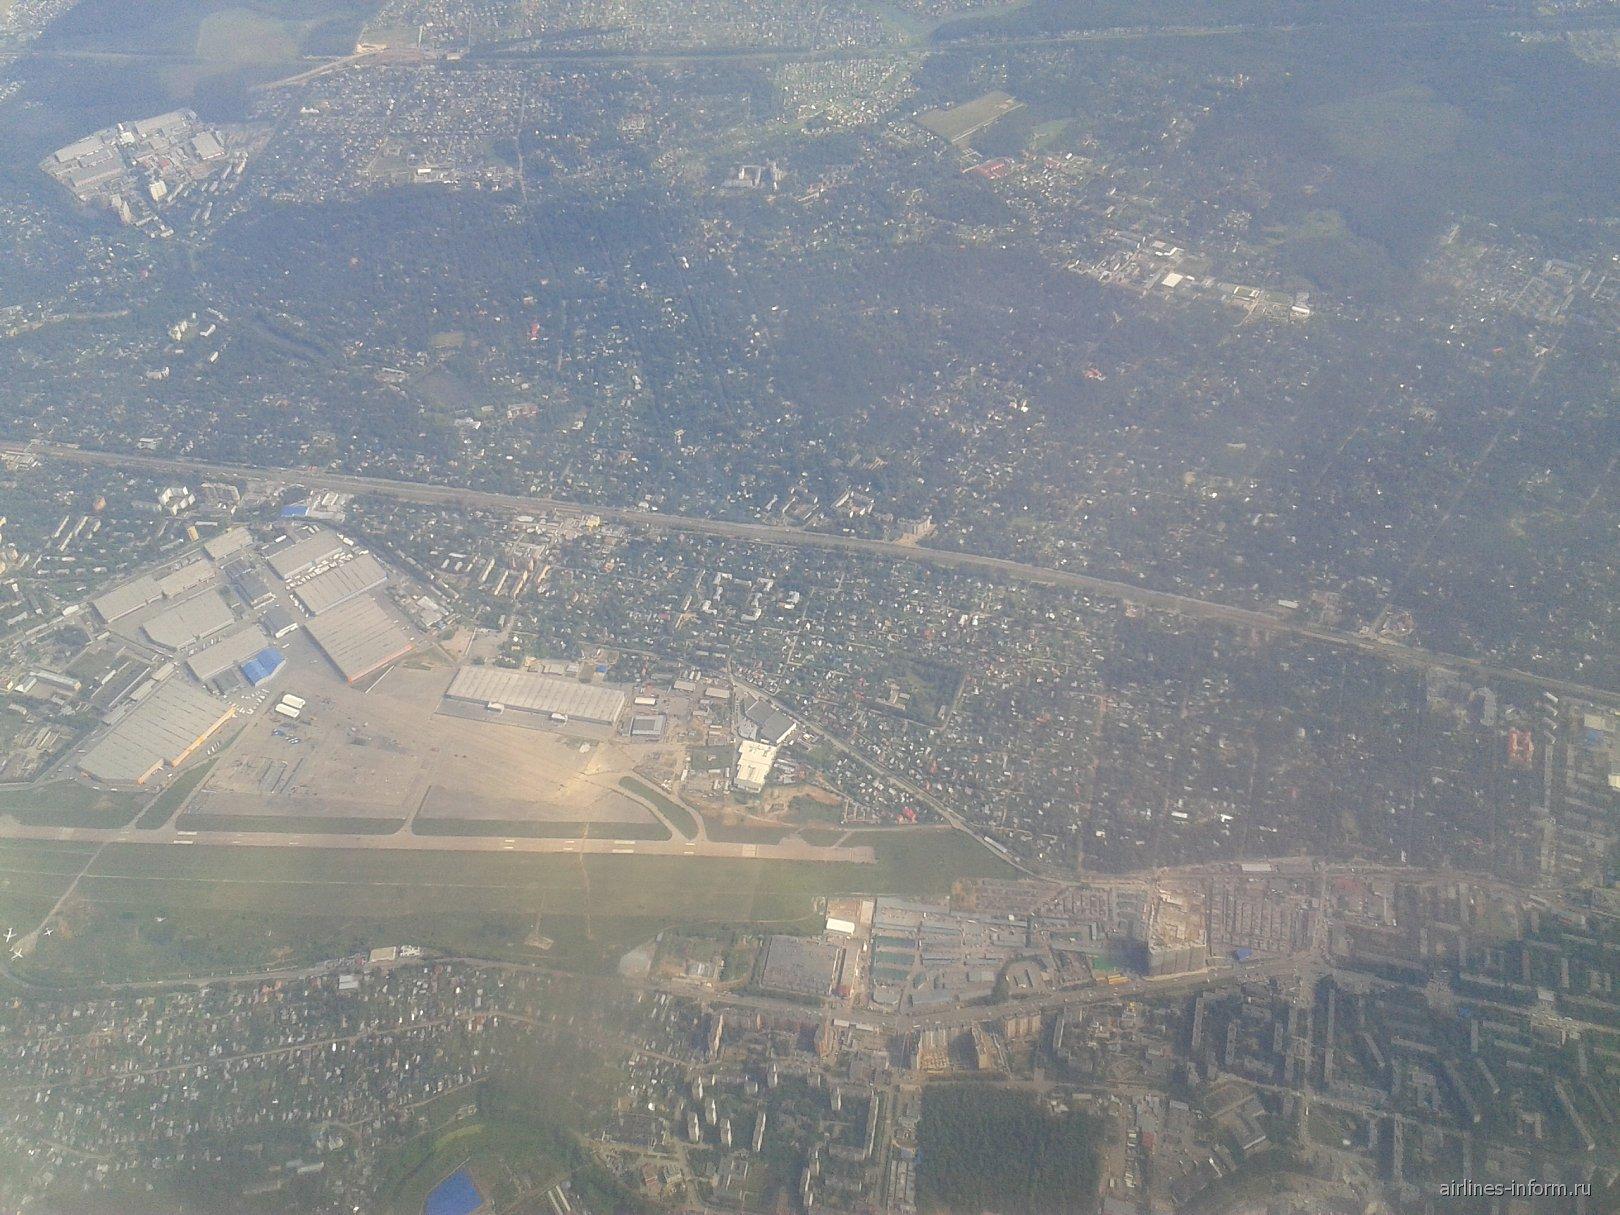 Бывший аэропорт Москва Быково